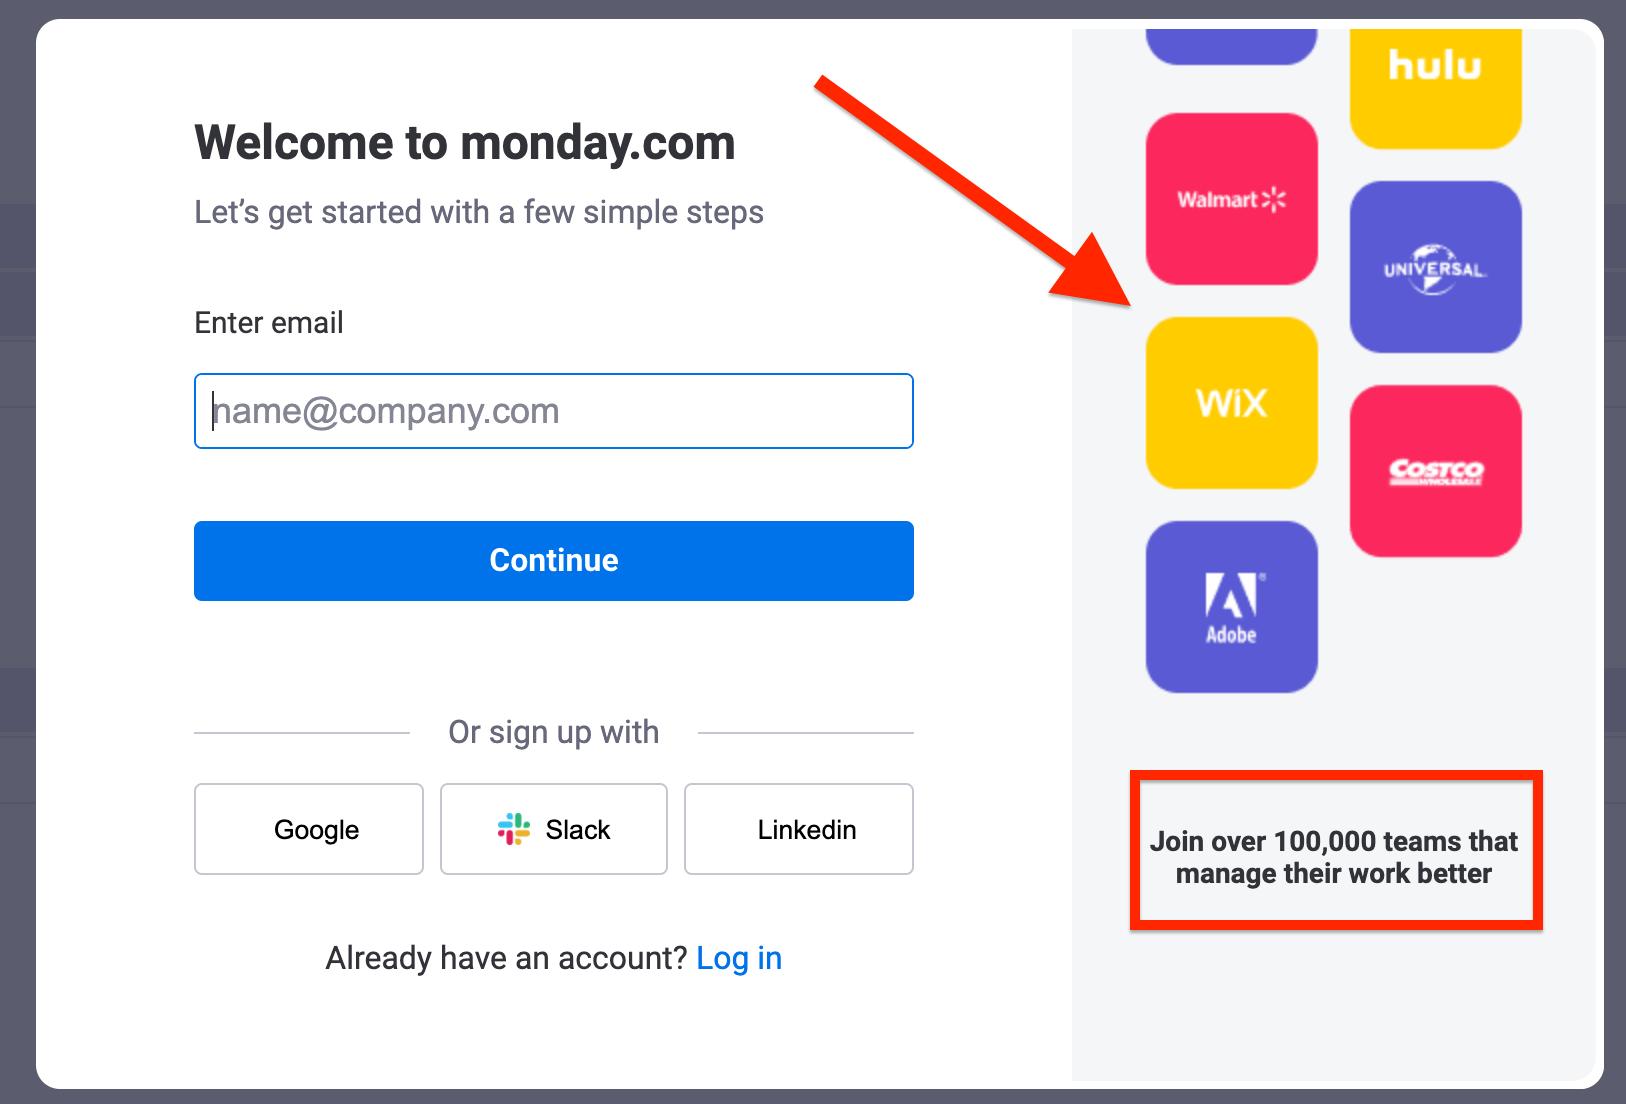 Screenshot of Monday.com sign-up form.